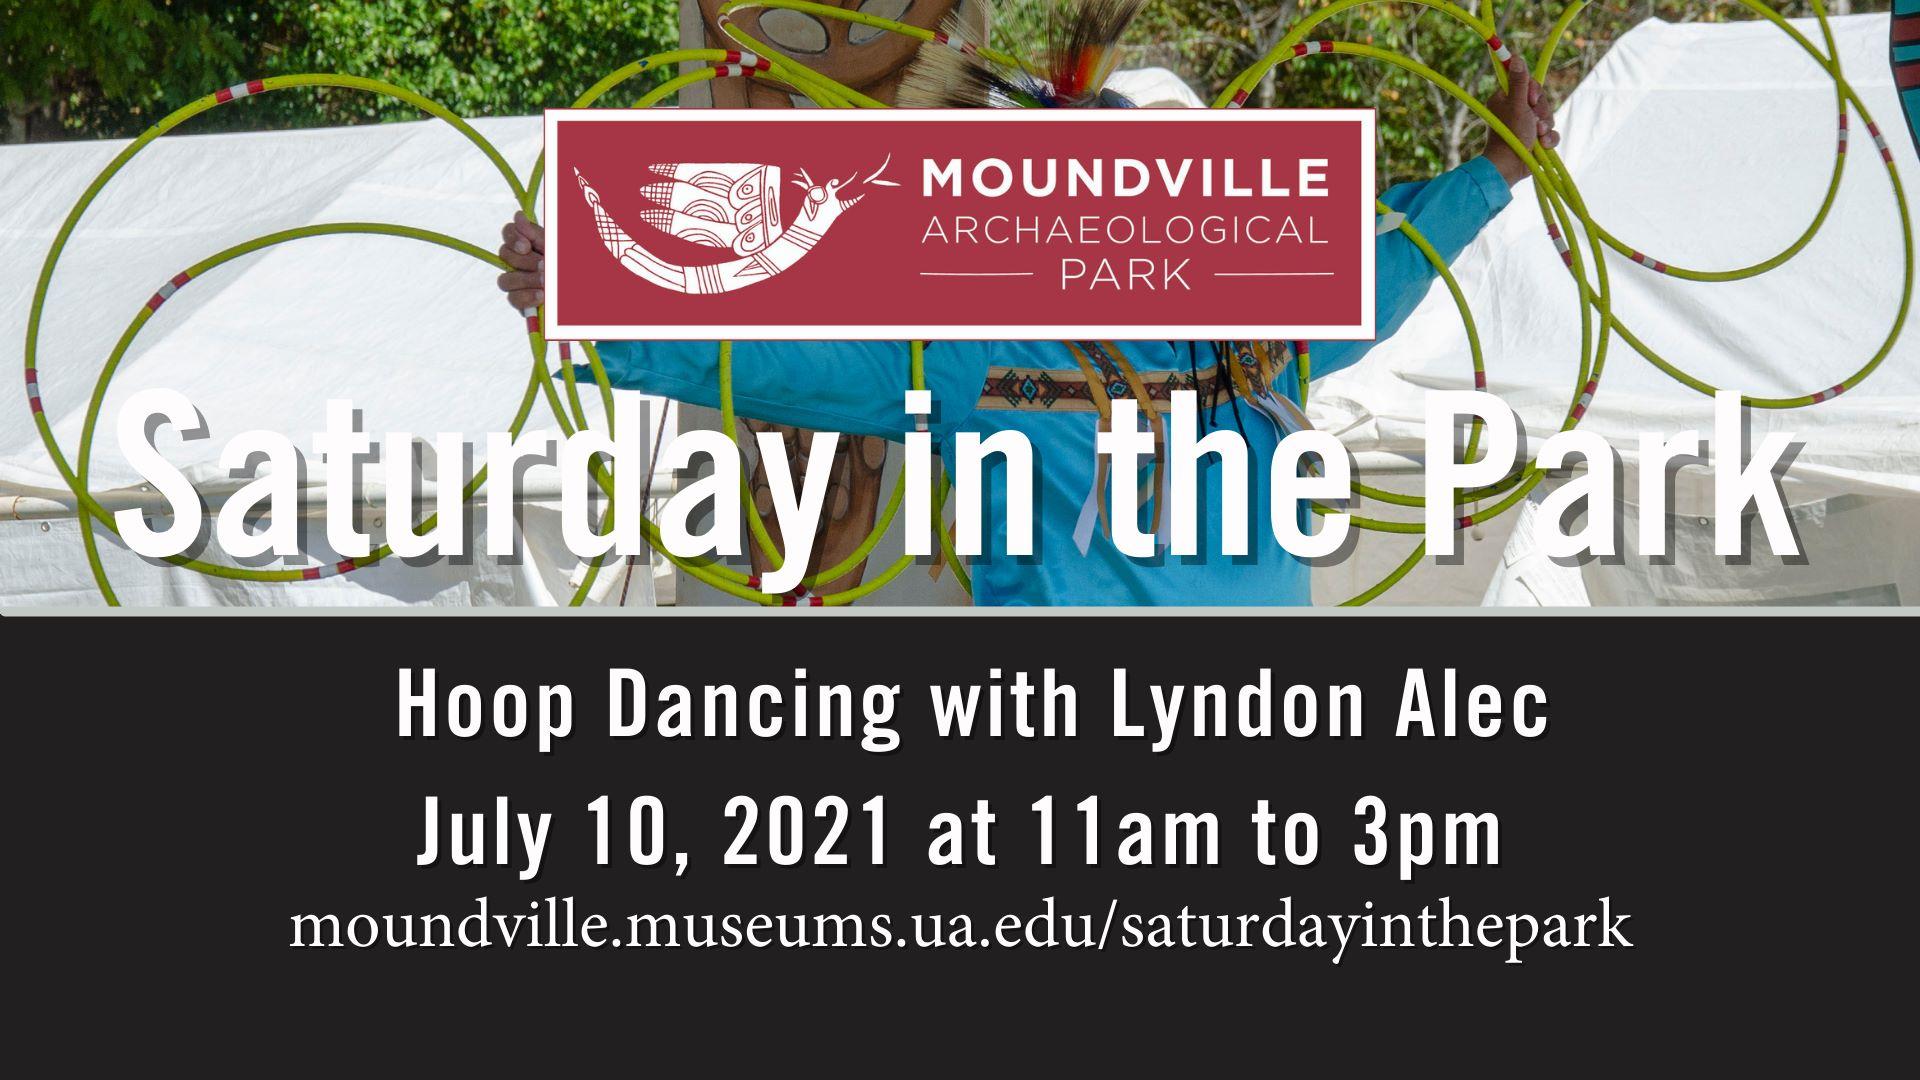 Saturday in the Park: Hoop Dancing with Lyndon Alec